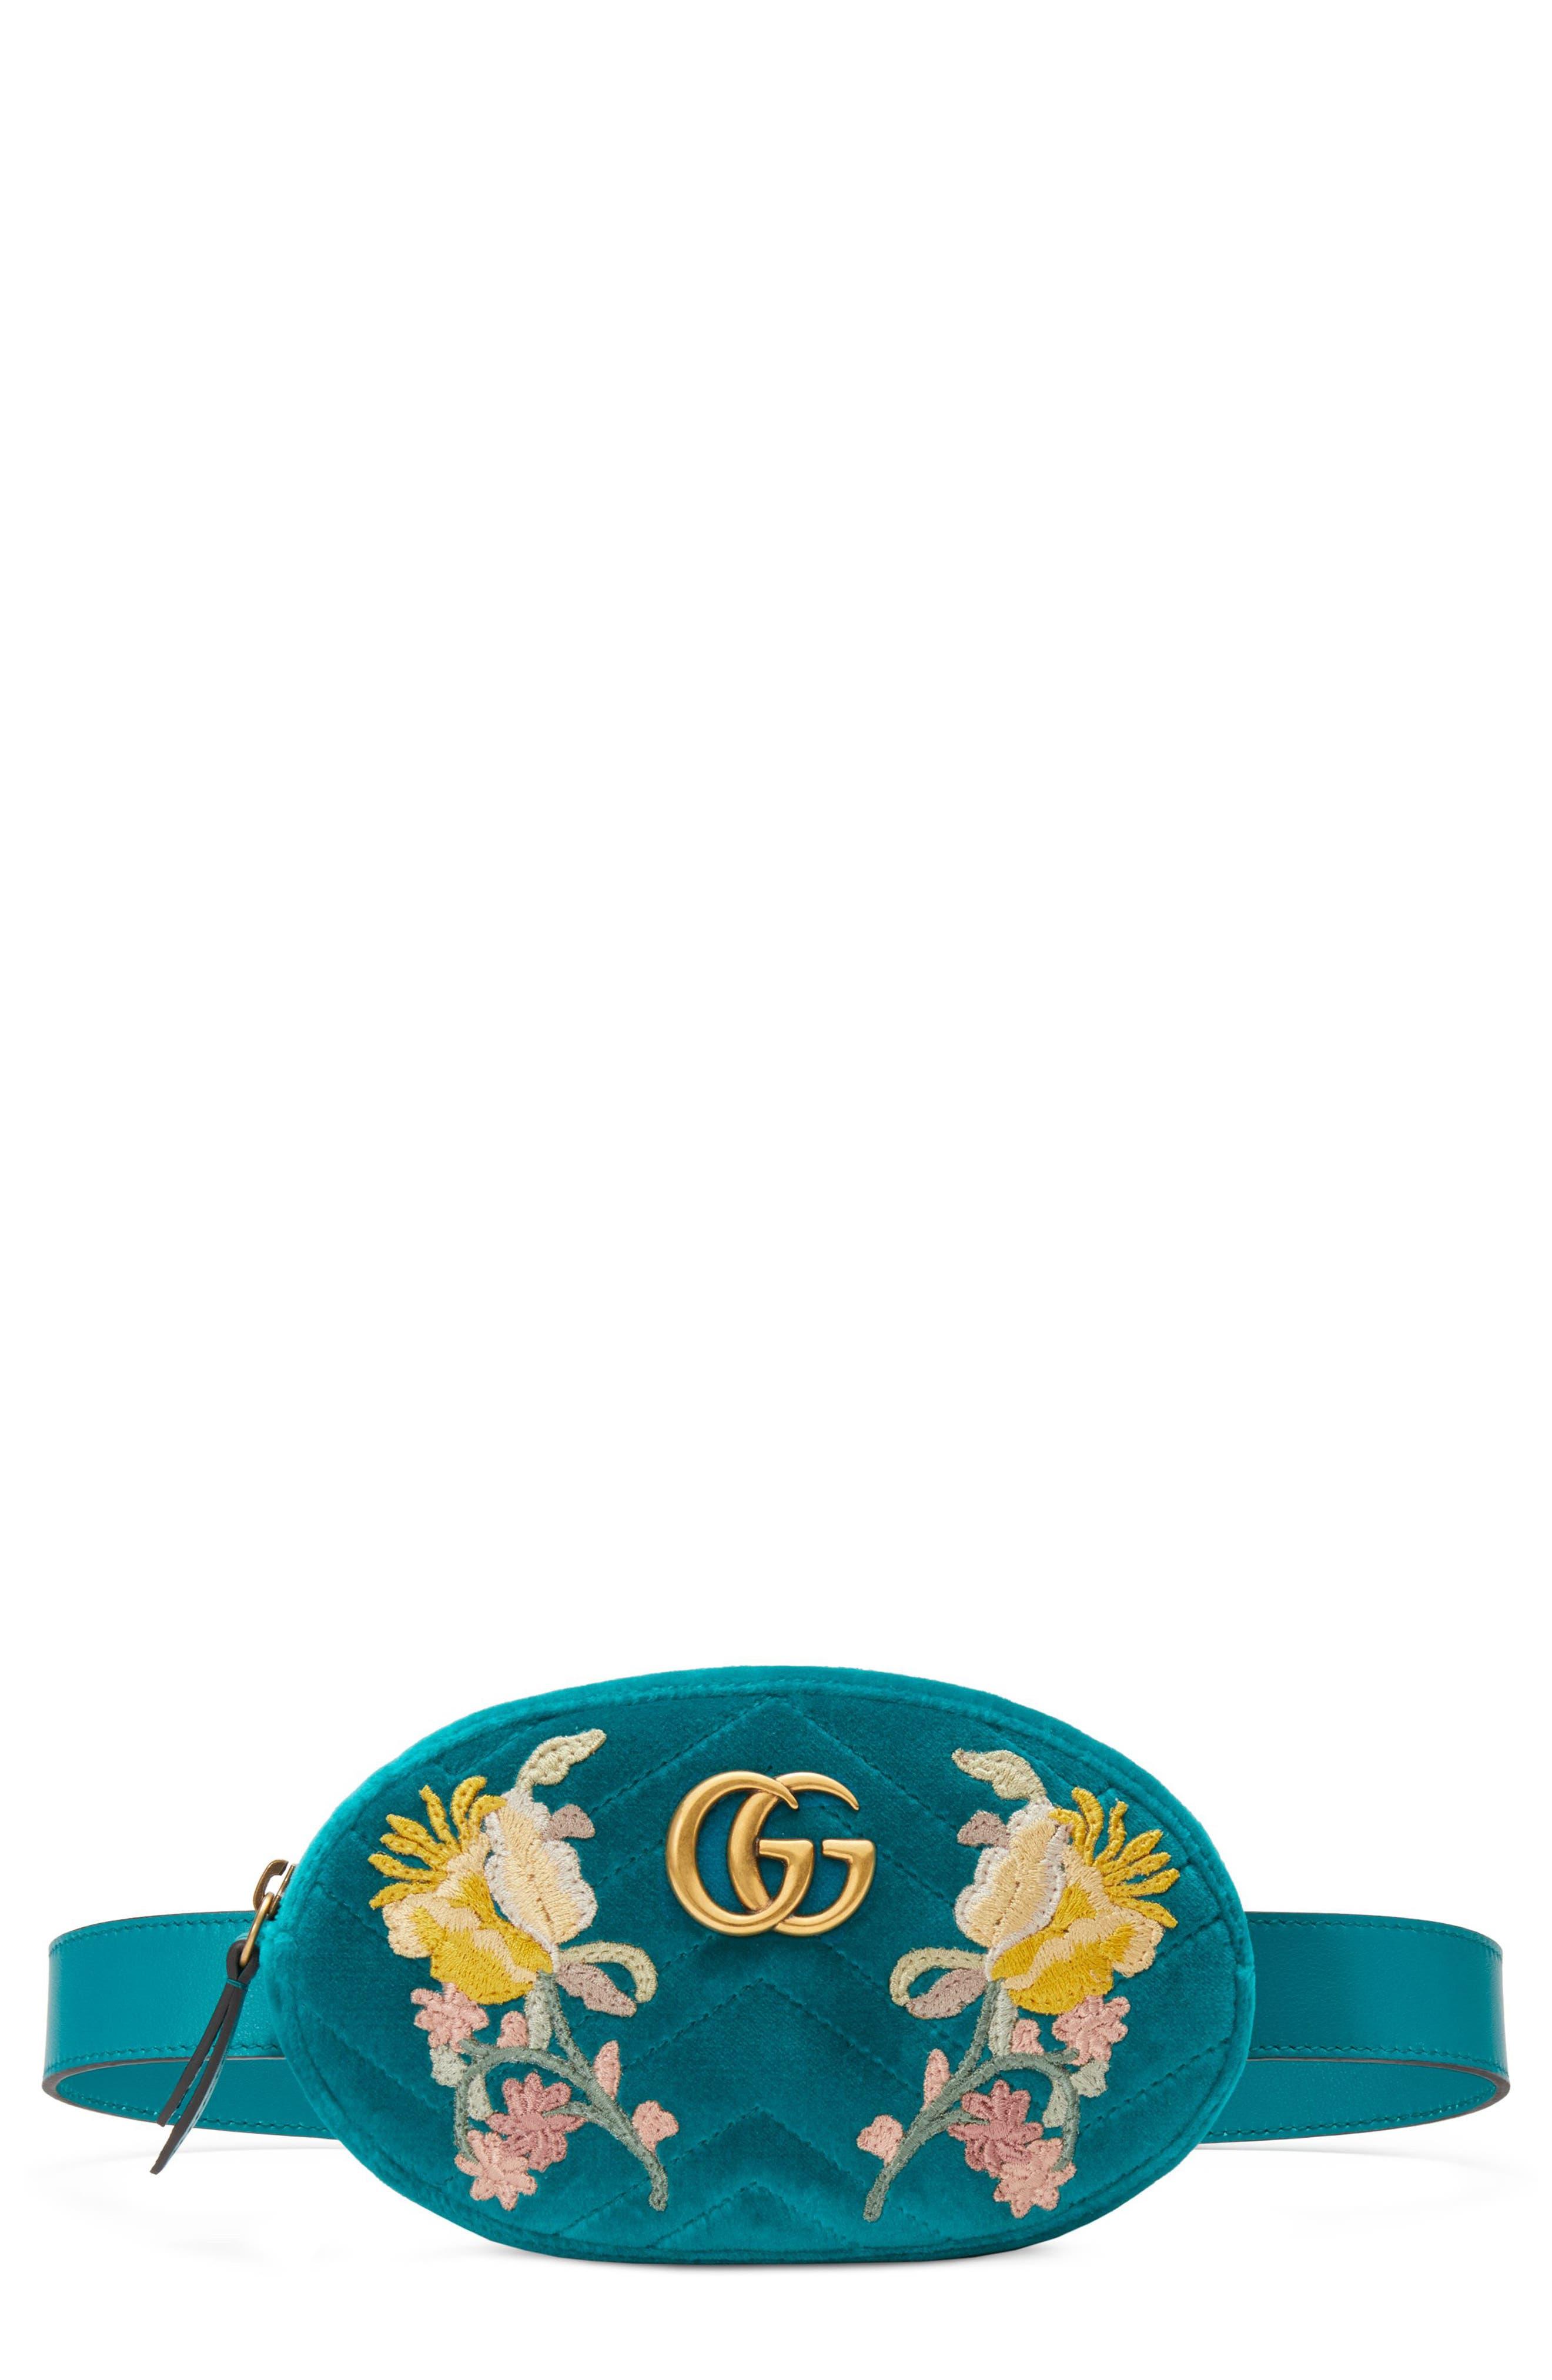 GG Marmont 2.0 Embroidered Velvet Belt Bag,                         Main,                         color,